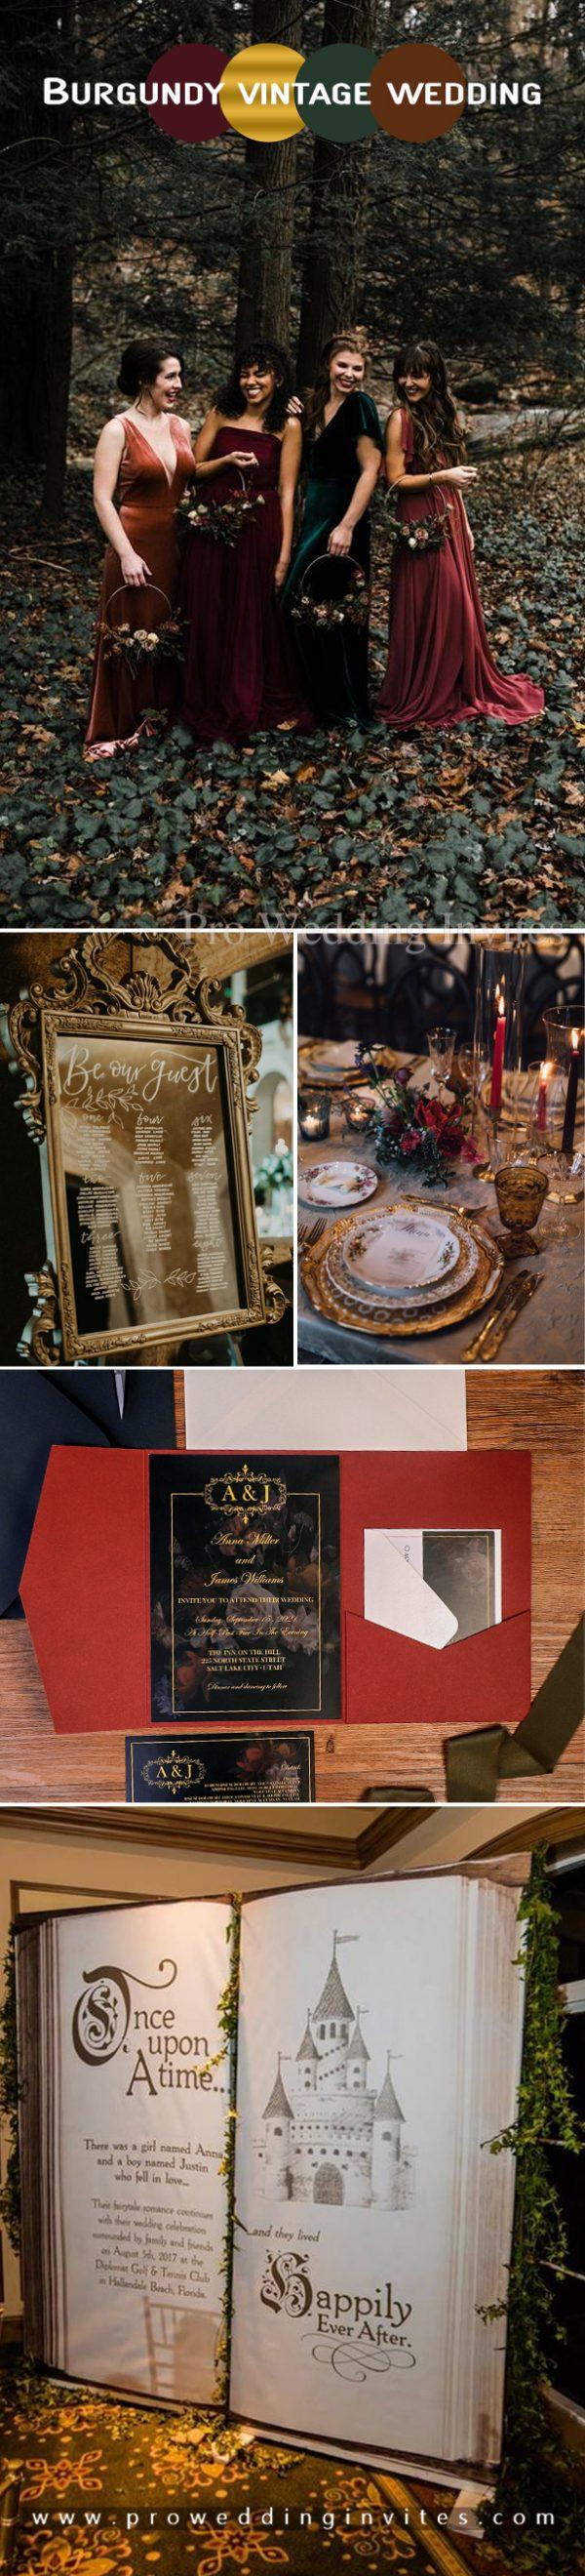 Burgundy, brown and gold vintage wedding